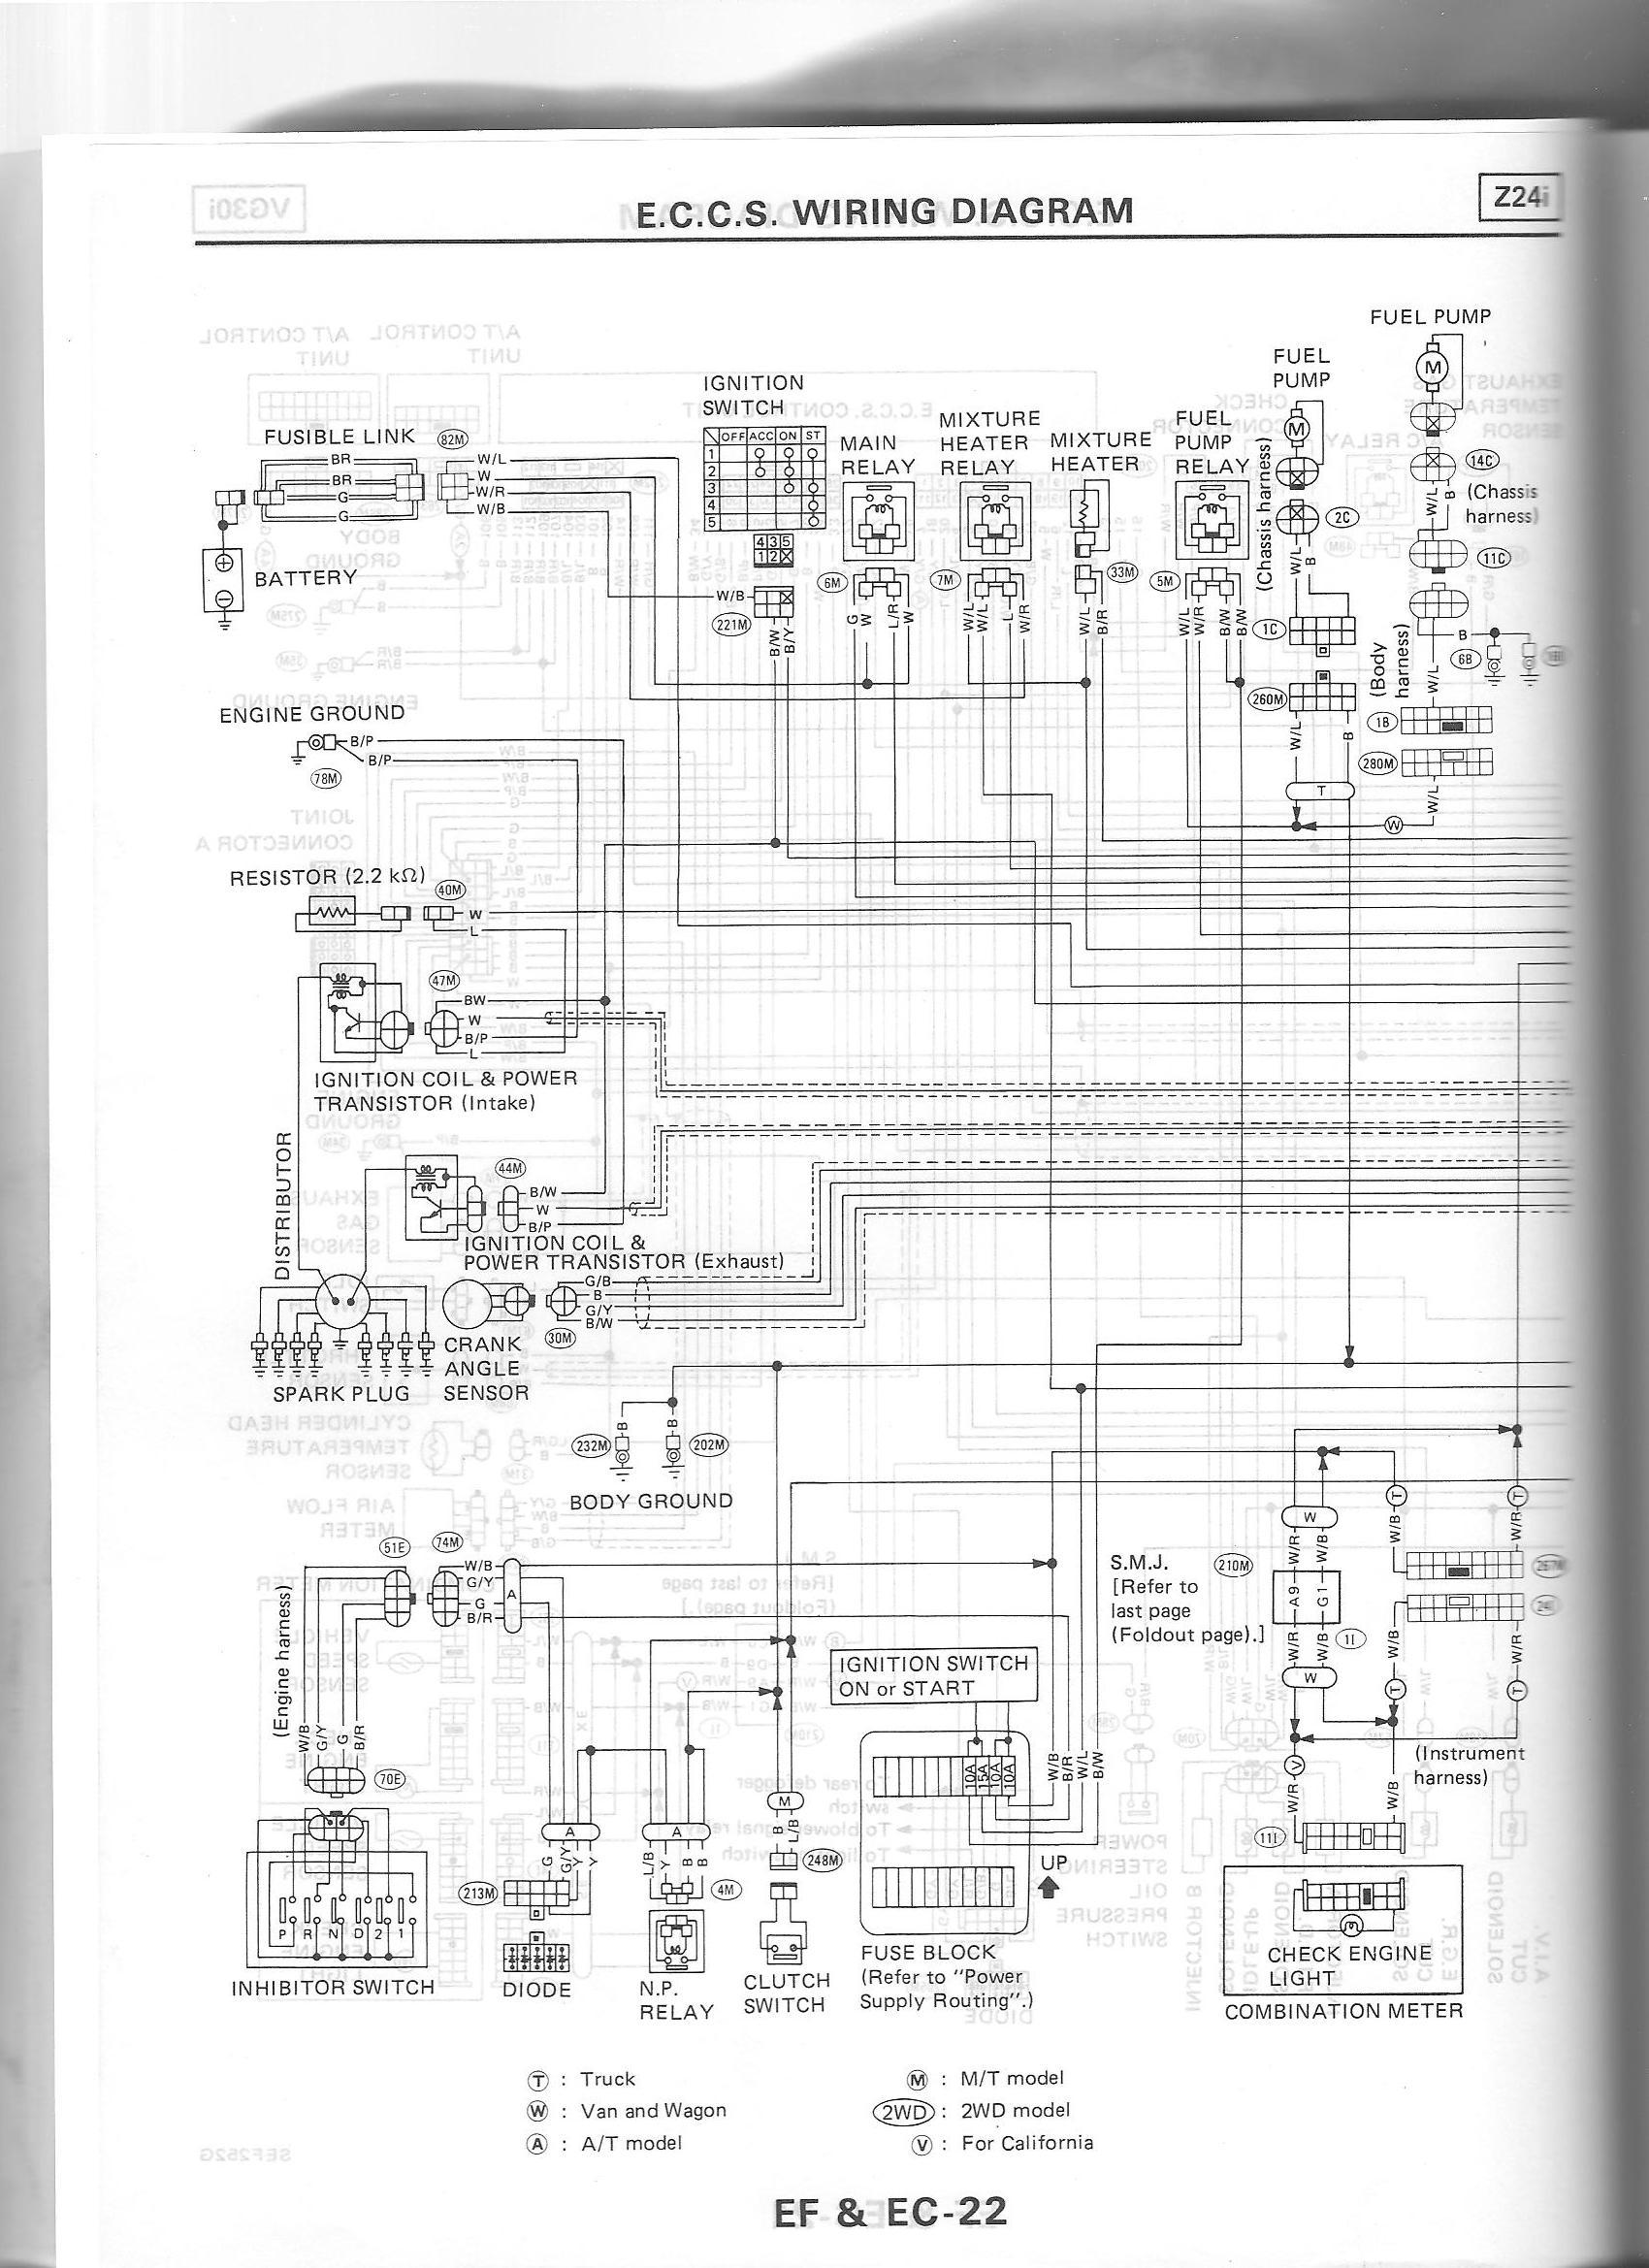 Nissan Navara Wiring Diagram D22 Opel Zafira A Fuse Box For Wiring Diagram Schematics